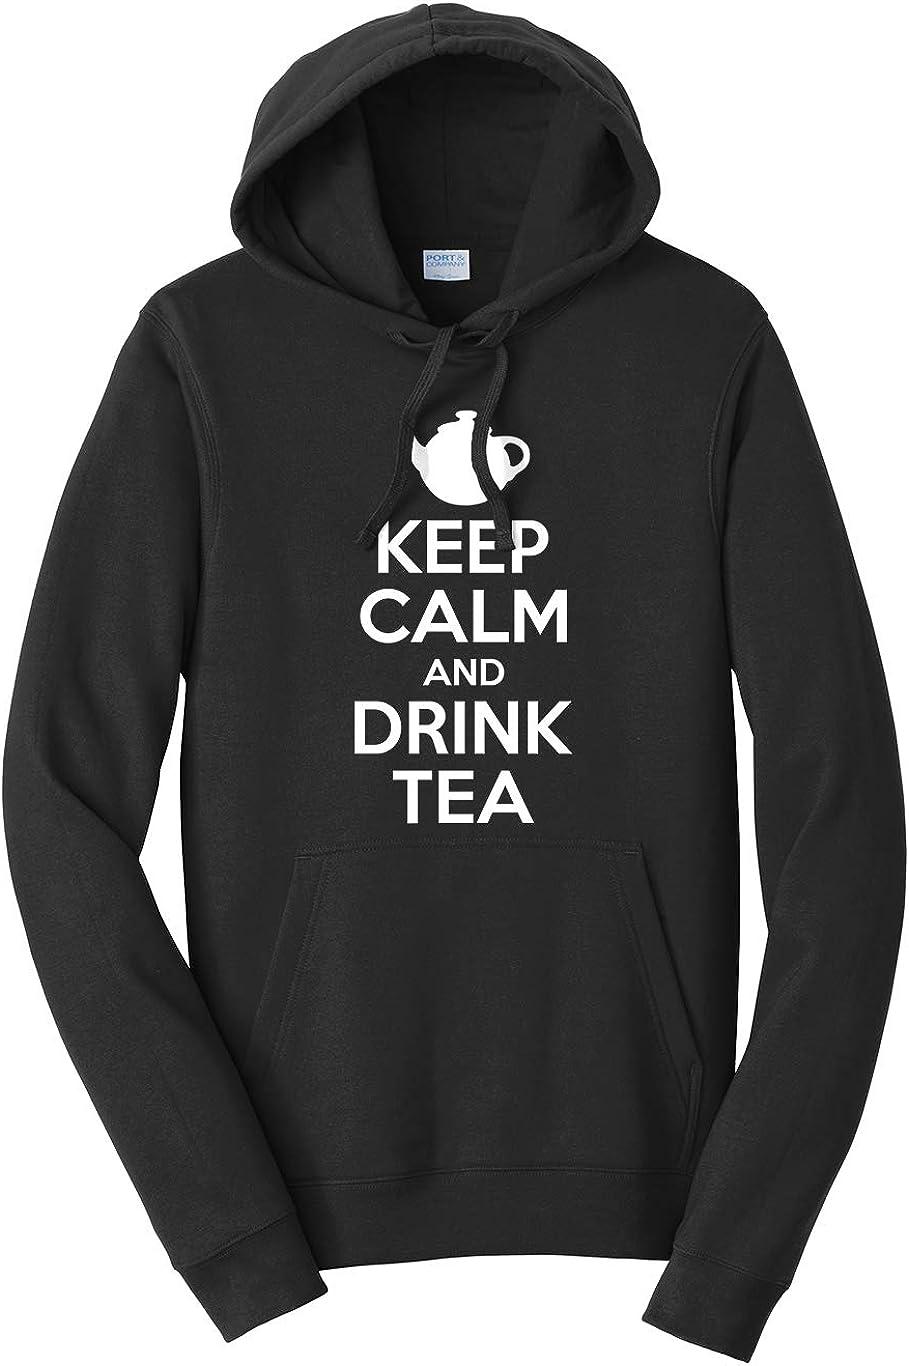 Tenacitee Unisex Keep Calm and Drink Tea Hooded Sweatshirt